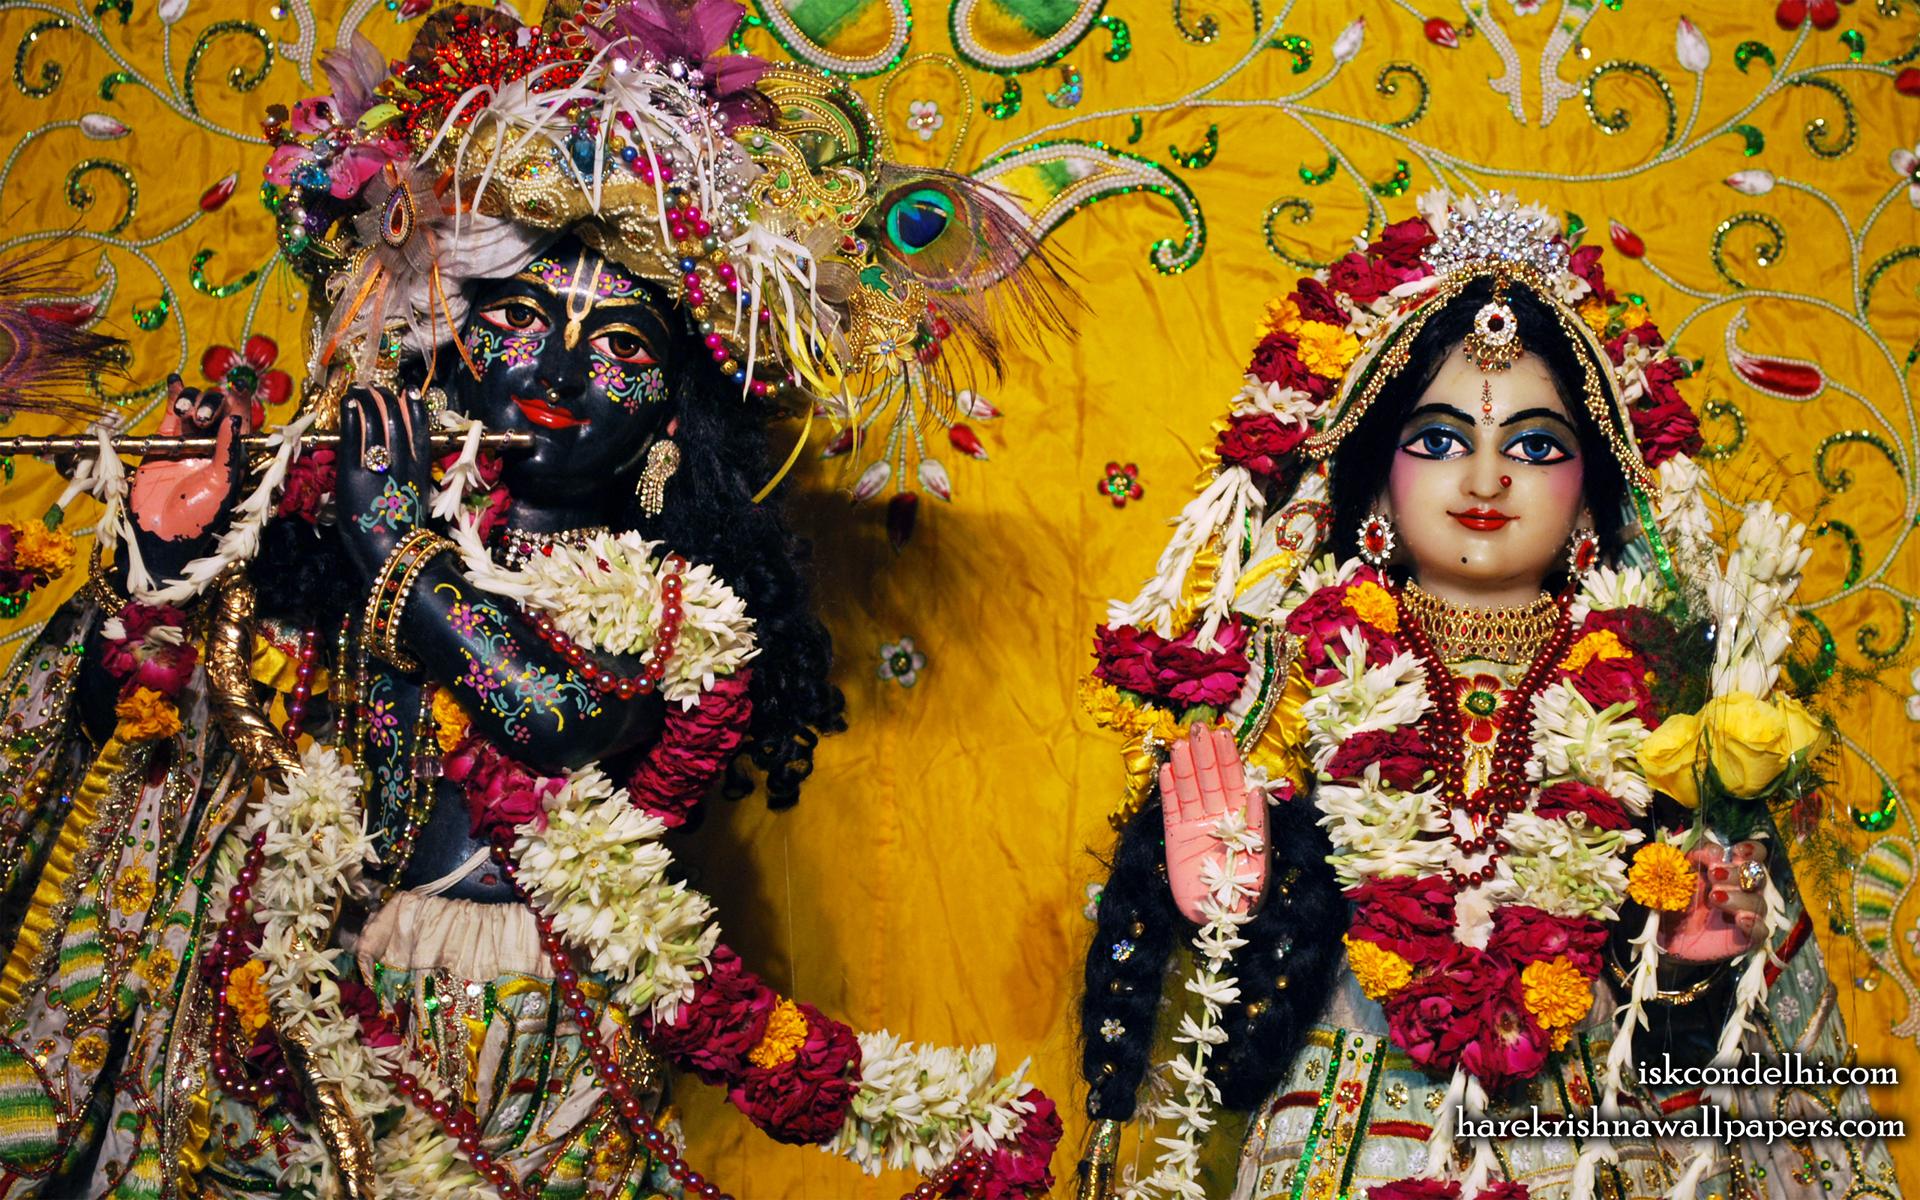 Sri Sri Radha Parthasarathi Close up Wallpaper (010) Size 1920x1200 Download